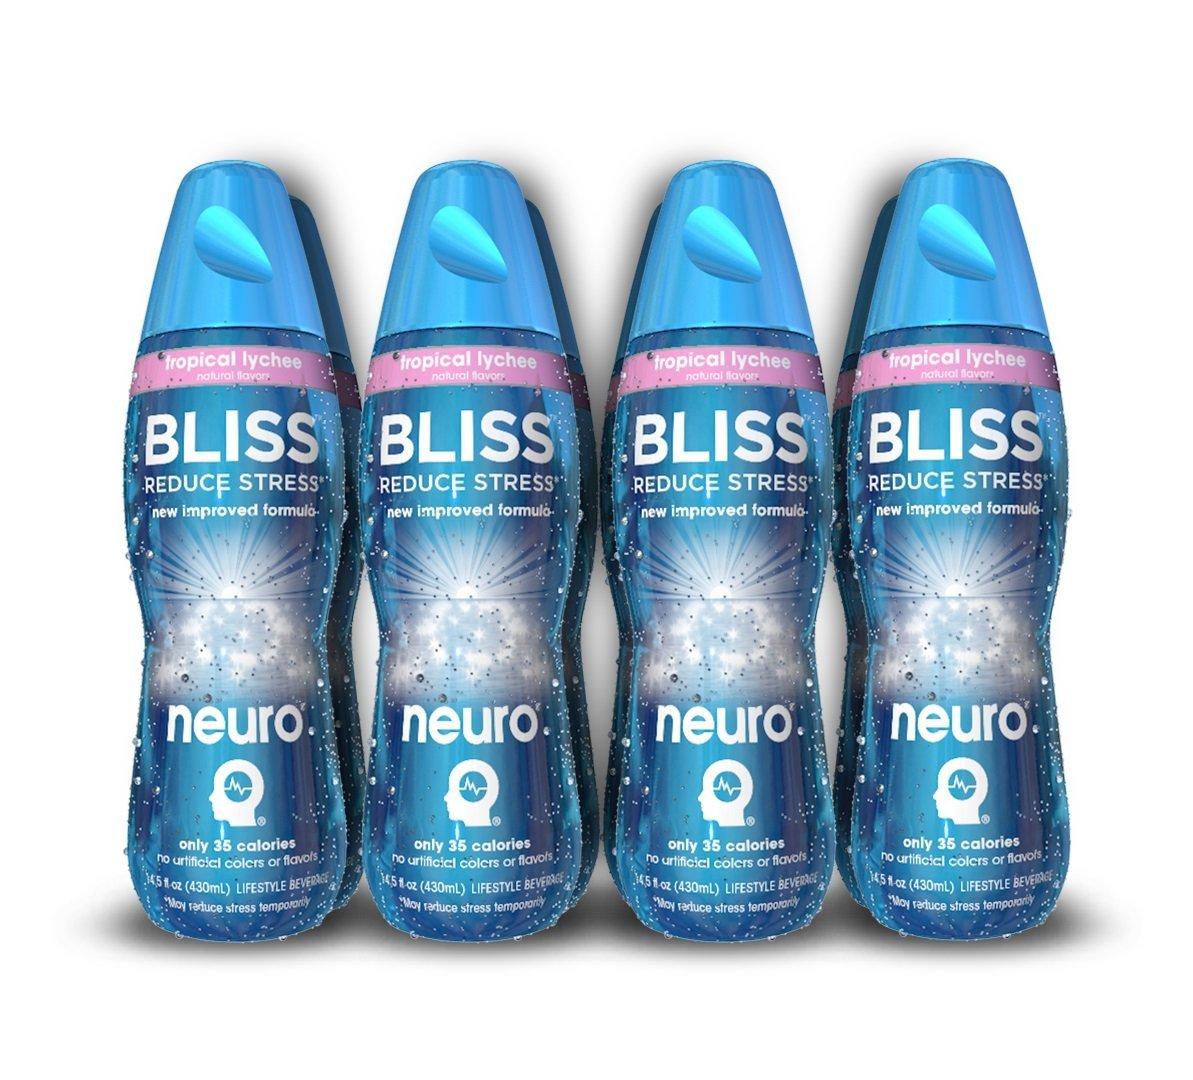 Neuro Bliss Nutritional Supplement Drink White Raspberry: Neuro Bliss